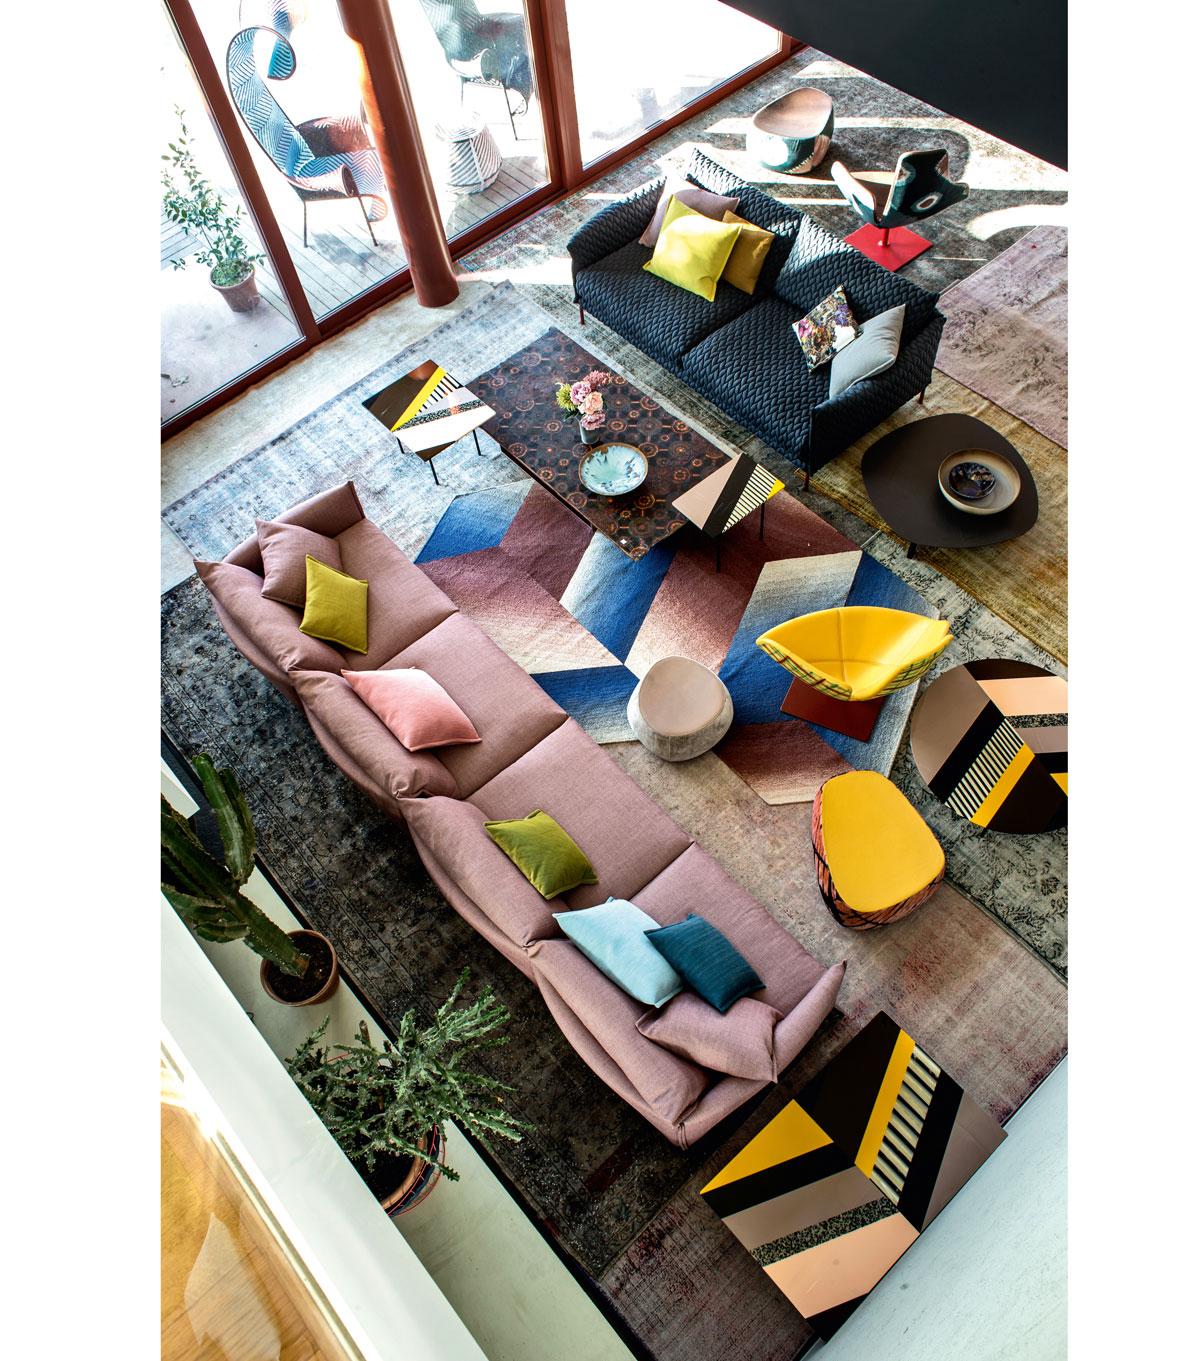 06_Chaplins_Furniture